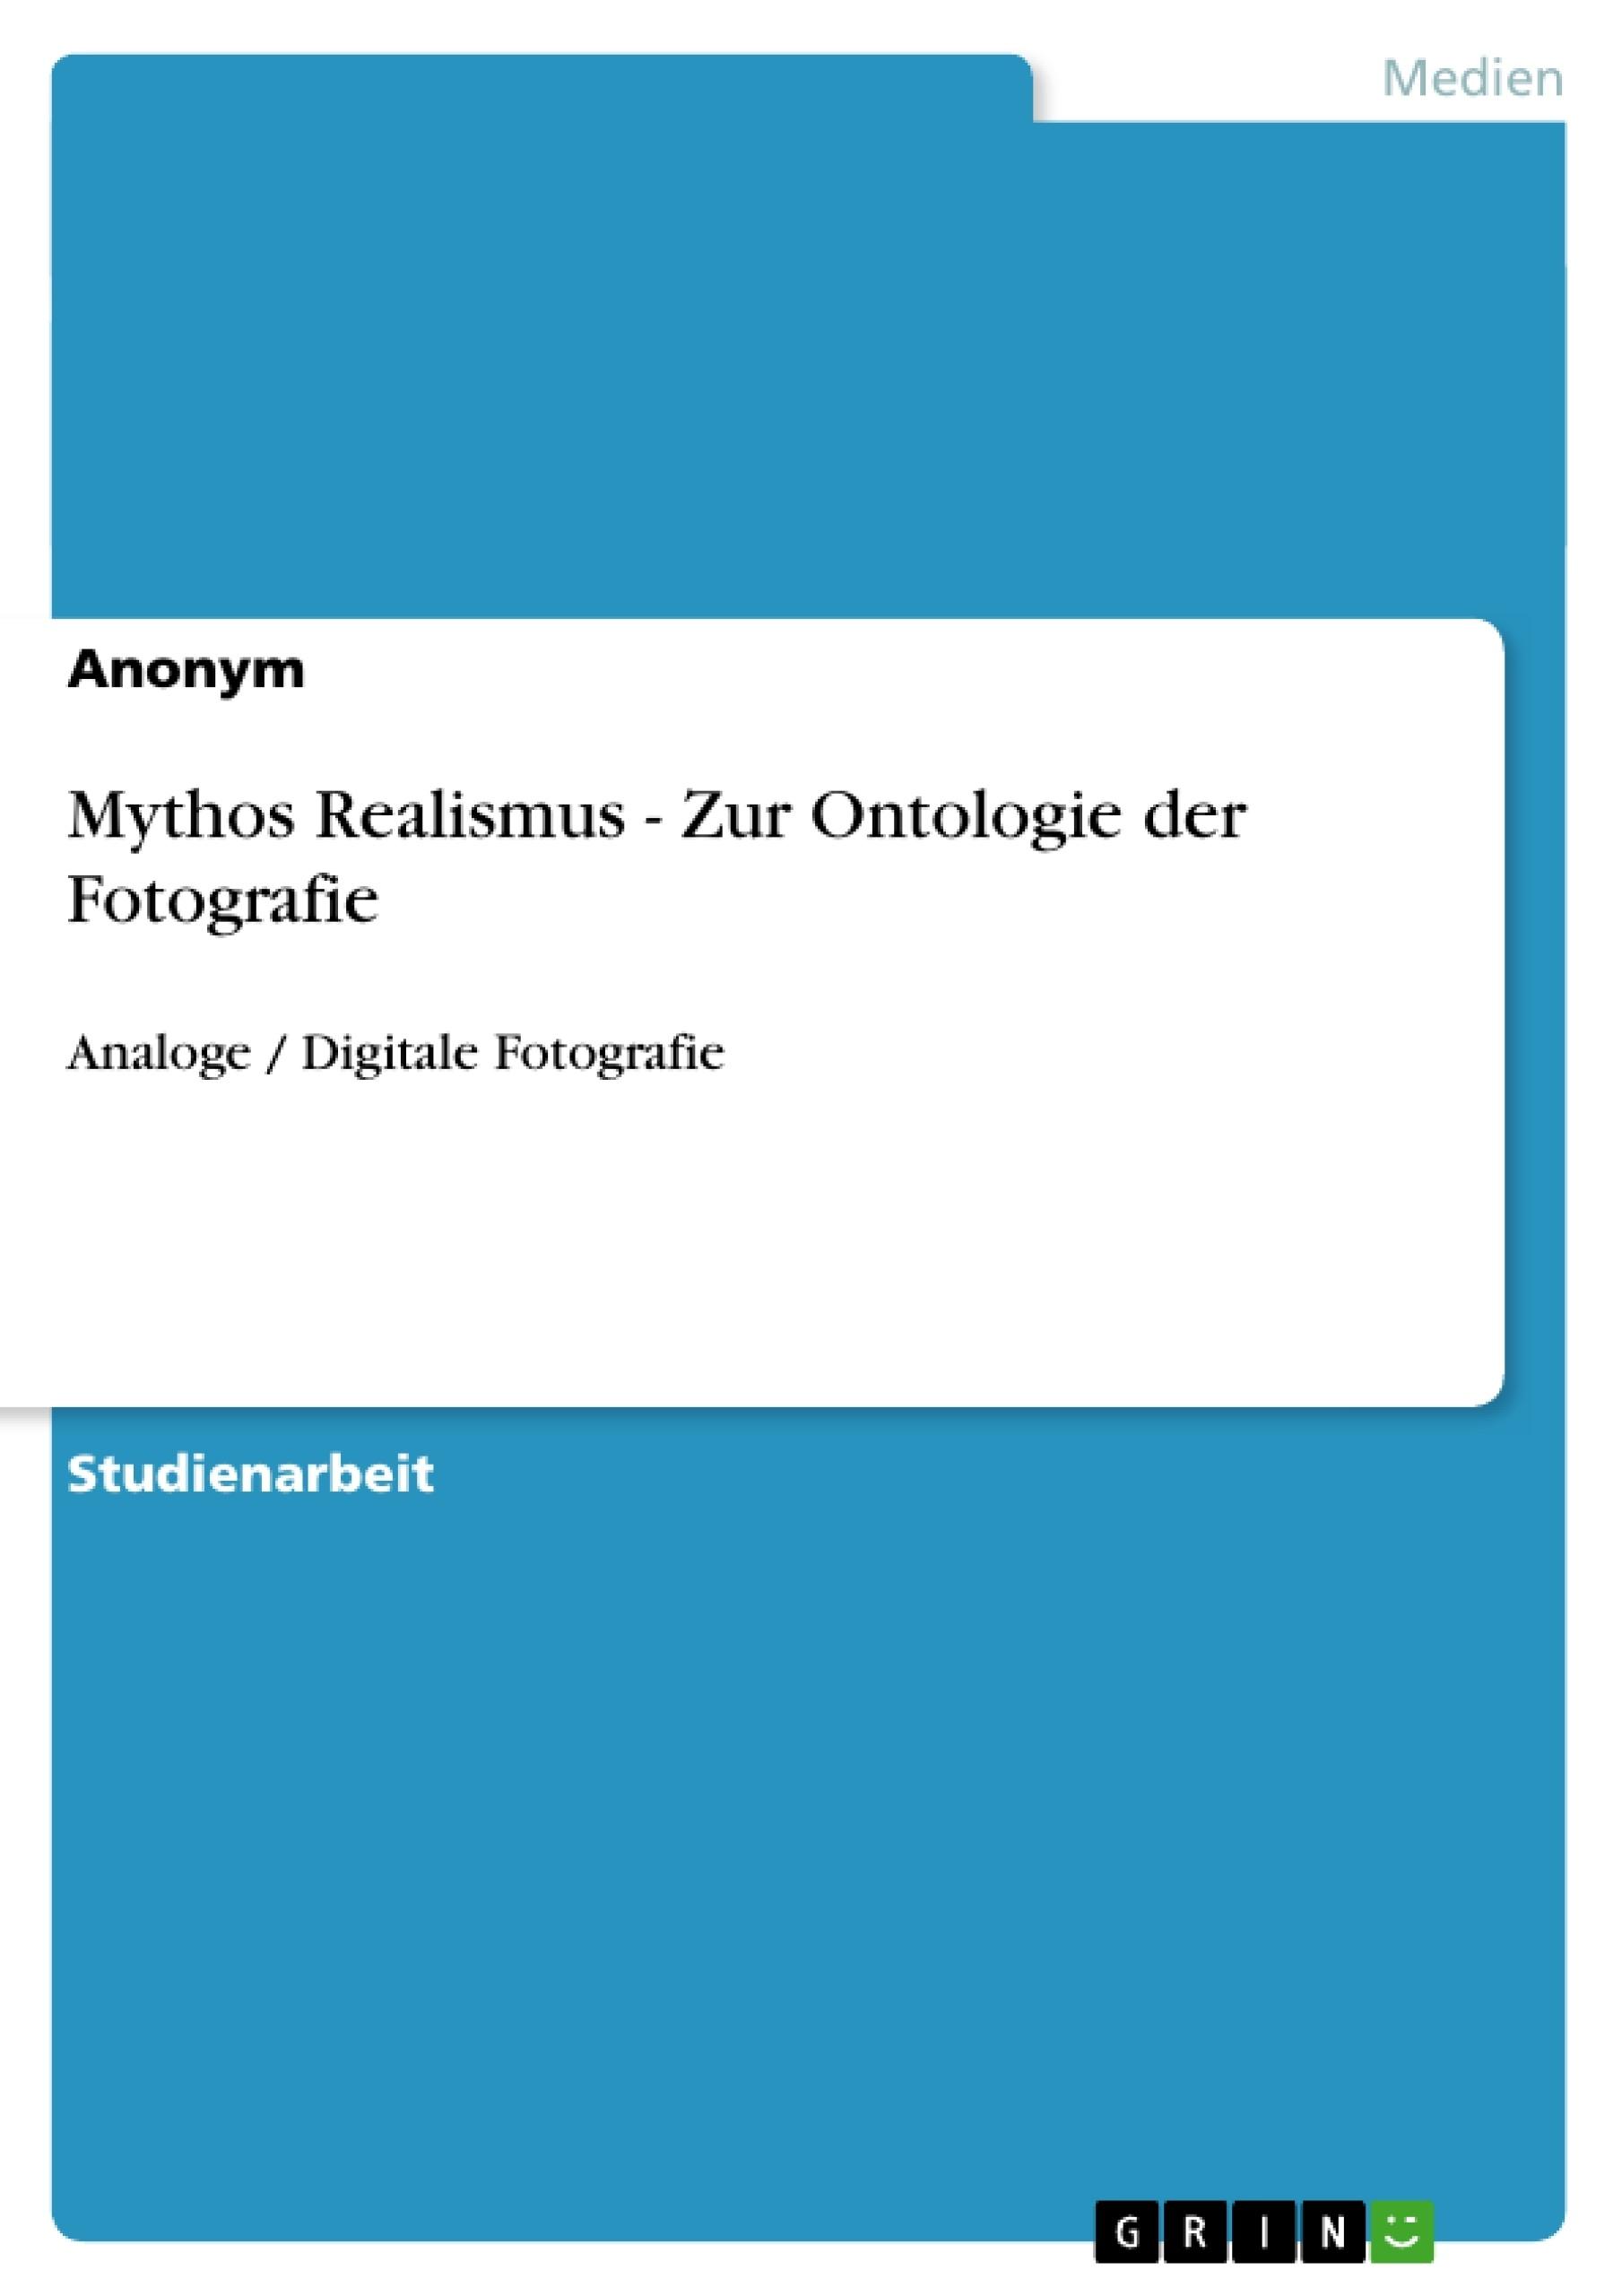 Titel: Mythos Realismus - Zur Ontologie der Fotografie